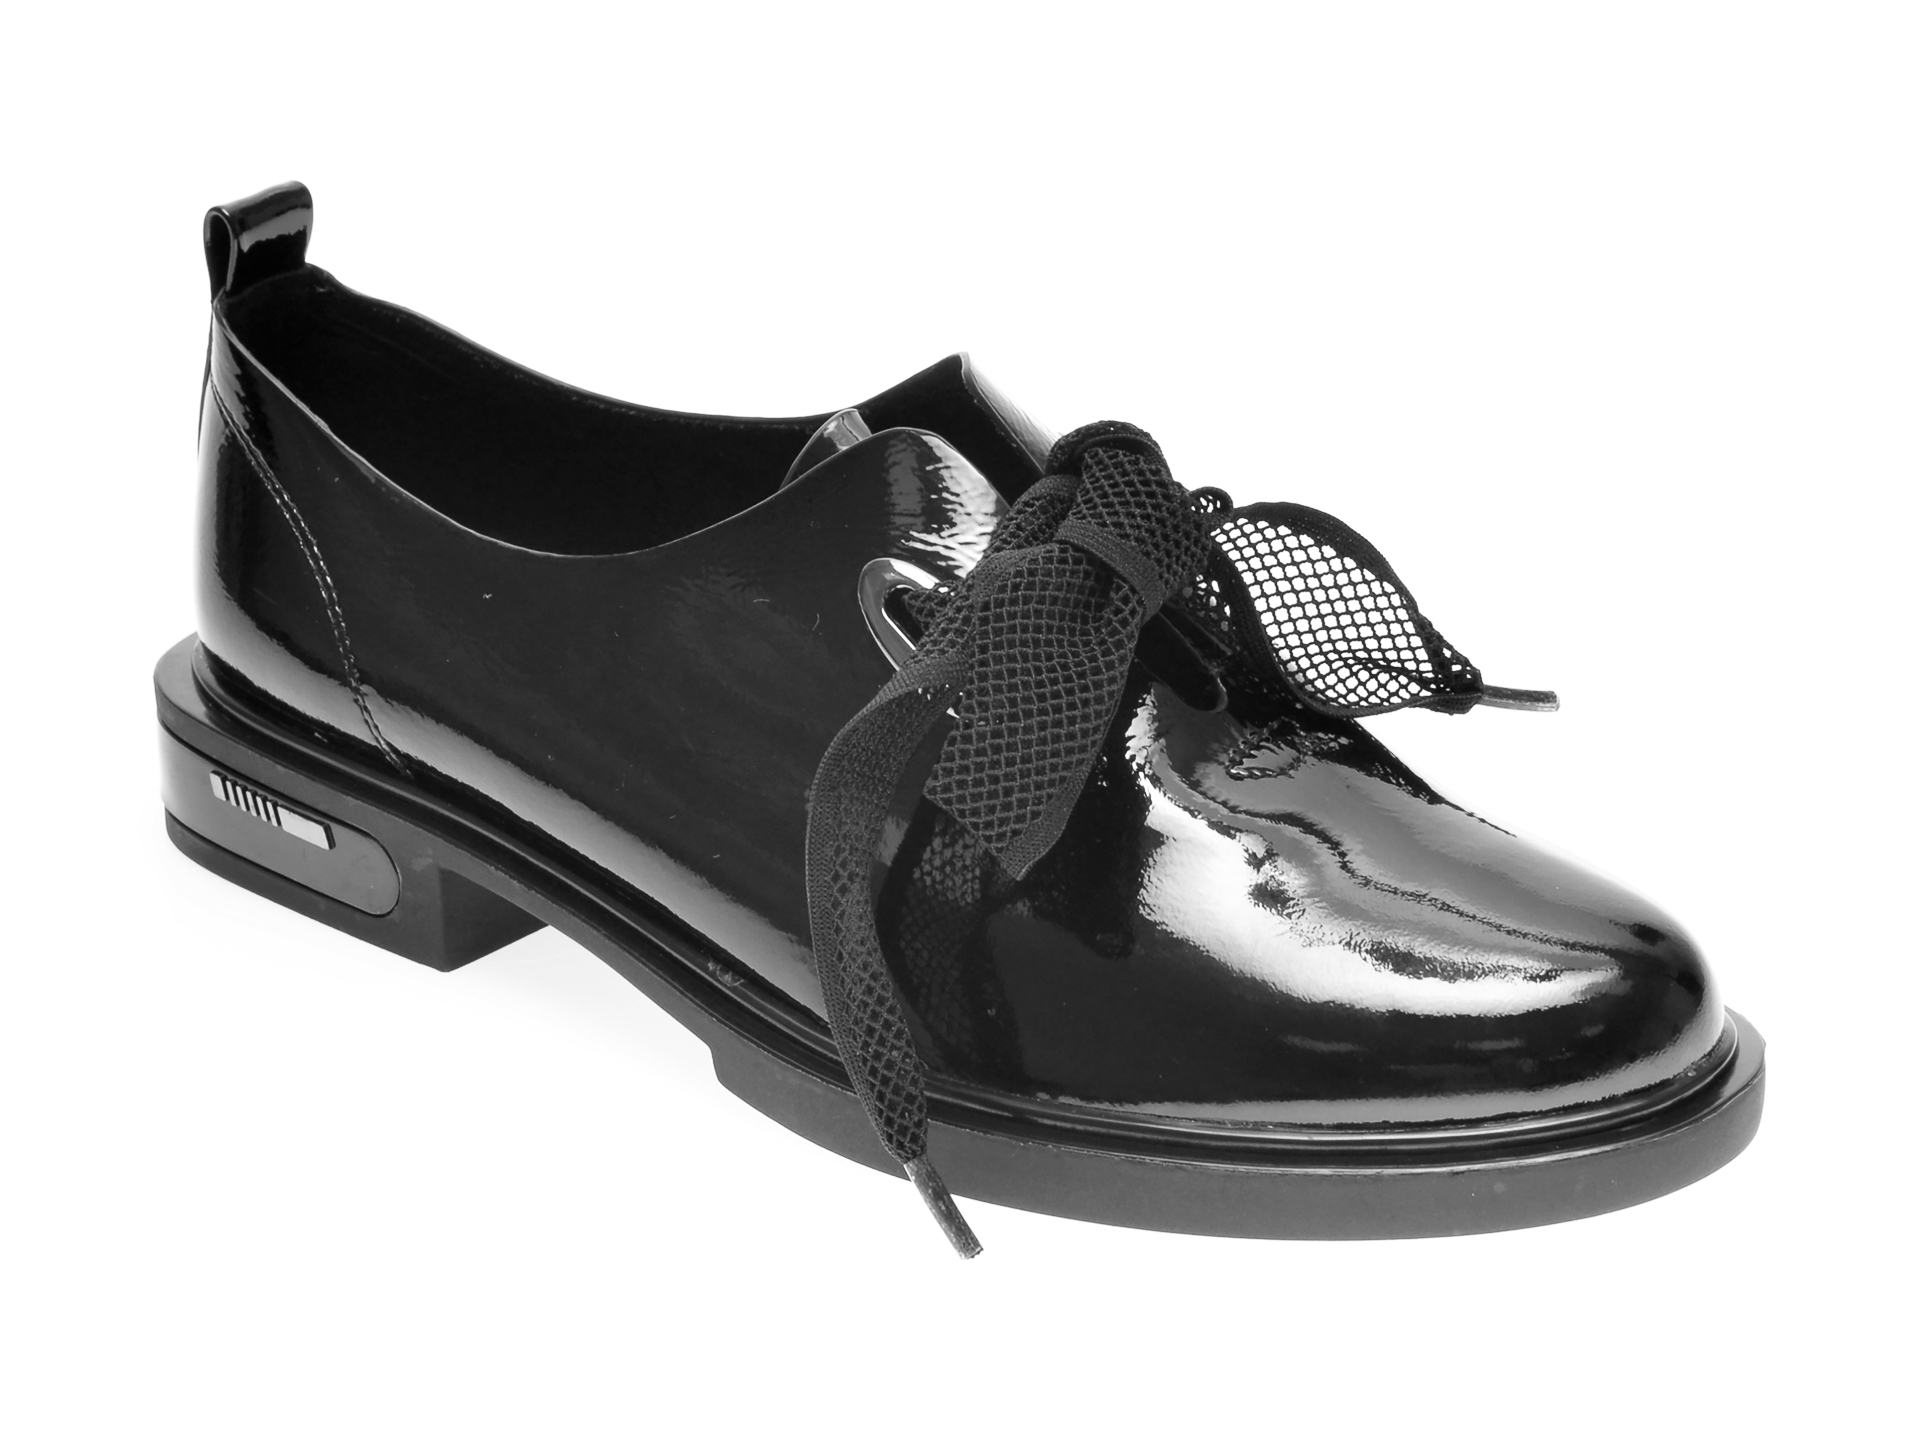 Pantofi FLAVIA PASSINI negri, H746010, din piele naturala lacuita New